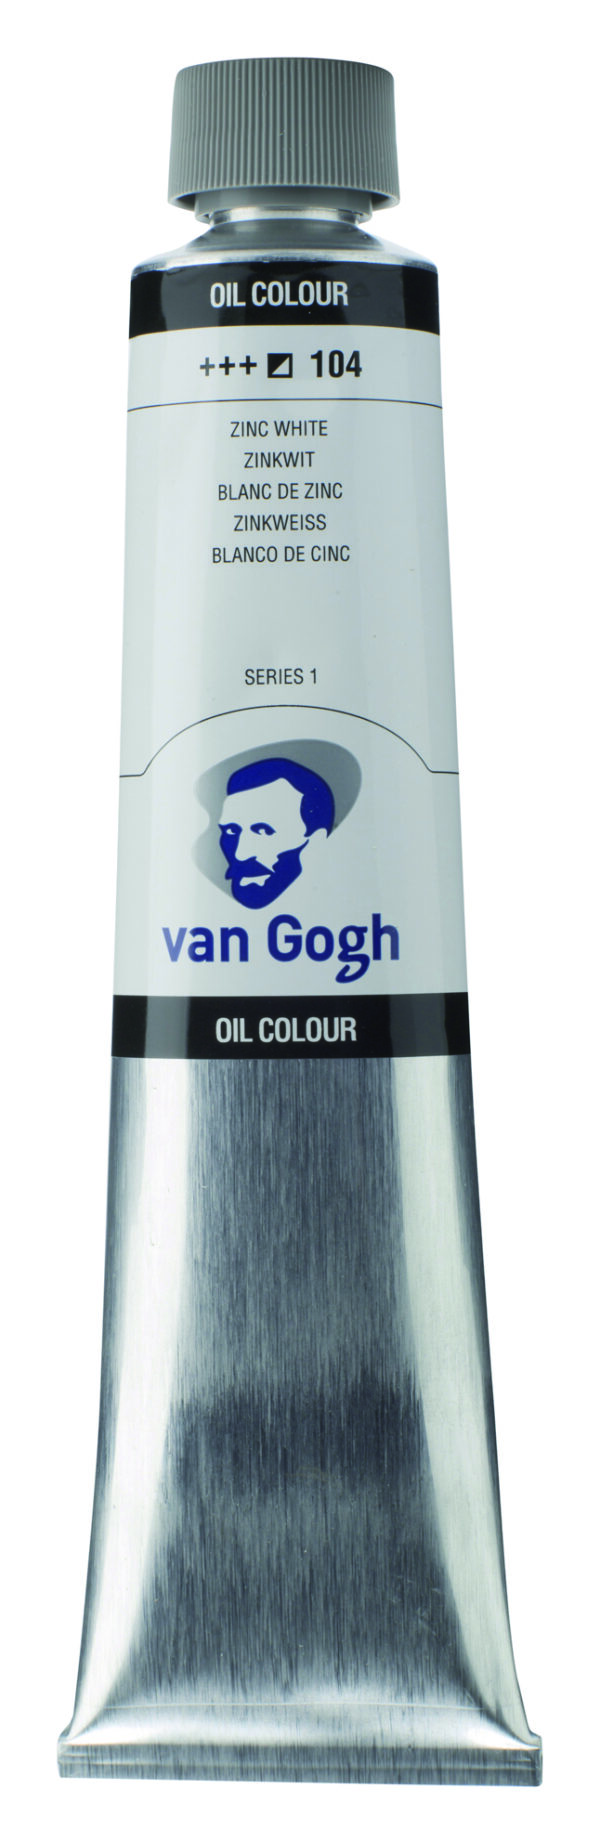 Van Gogh 104 Zink white (safflor oil) - 200 ml